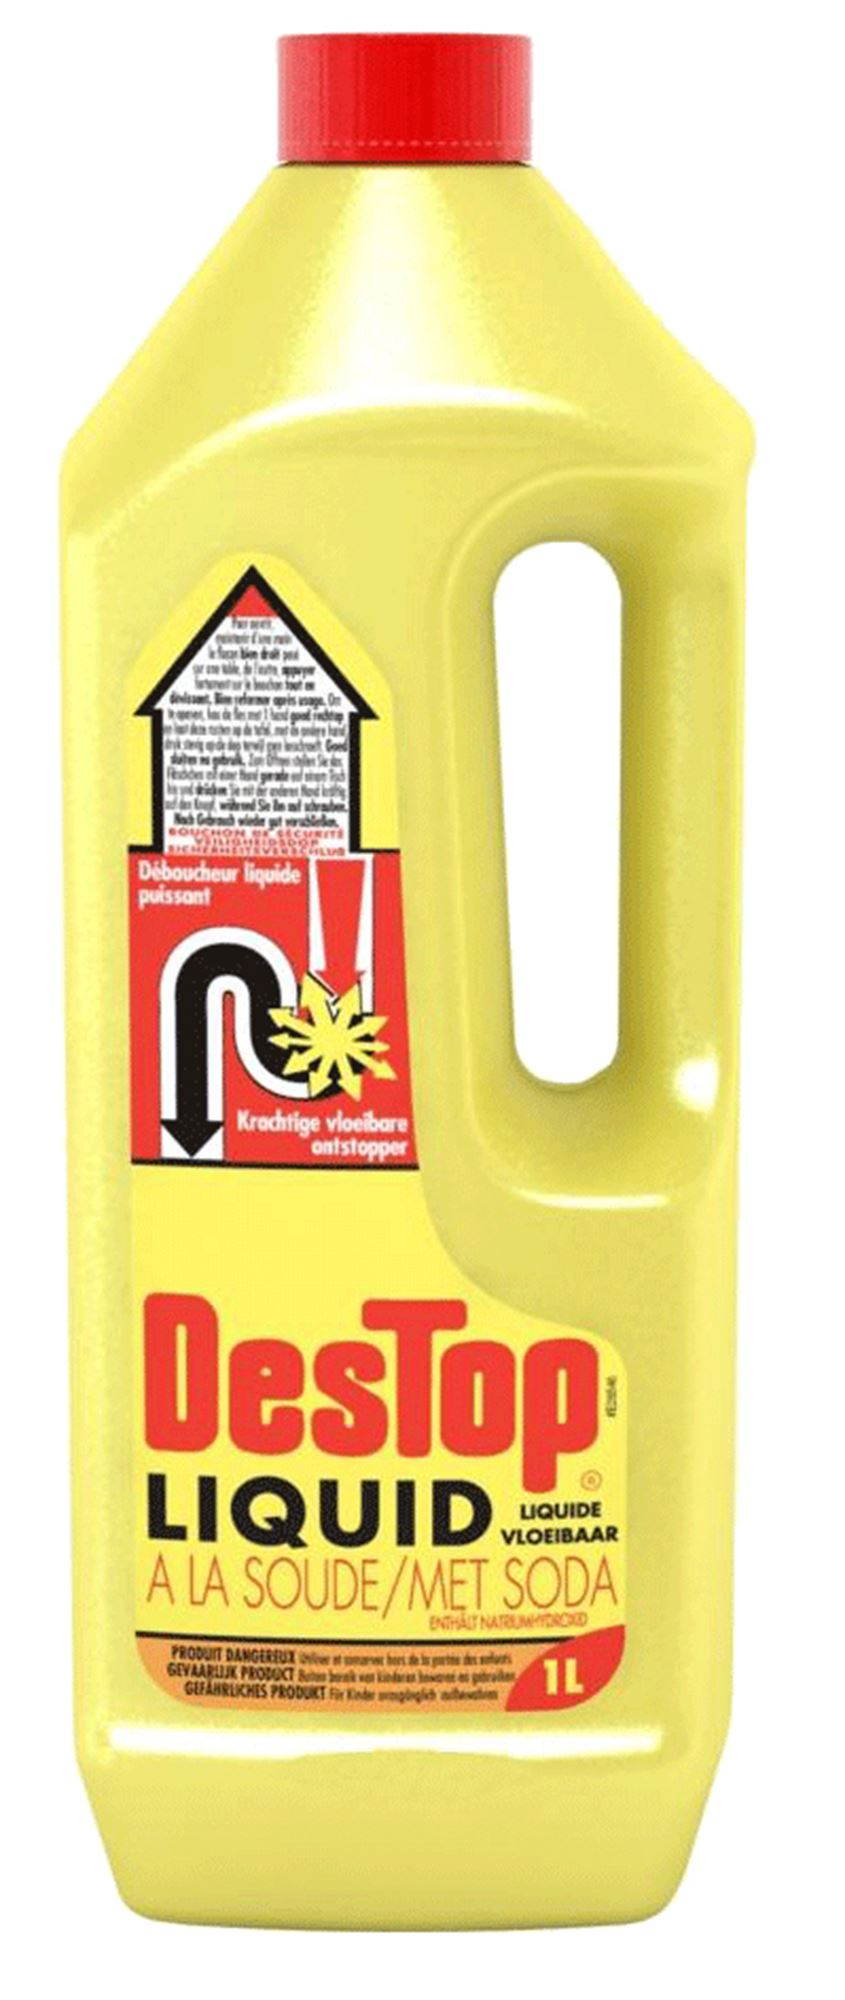 Destop Liquid Drain Cleaner Pipe 1 Liter Bottle